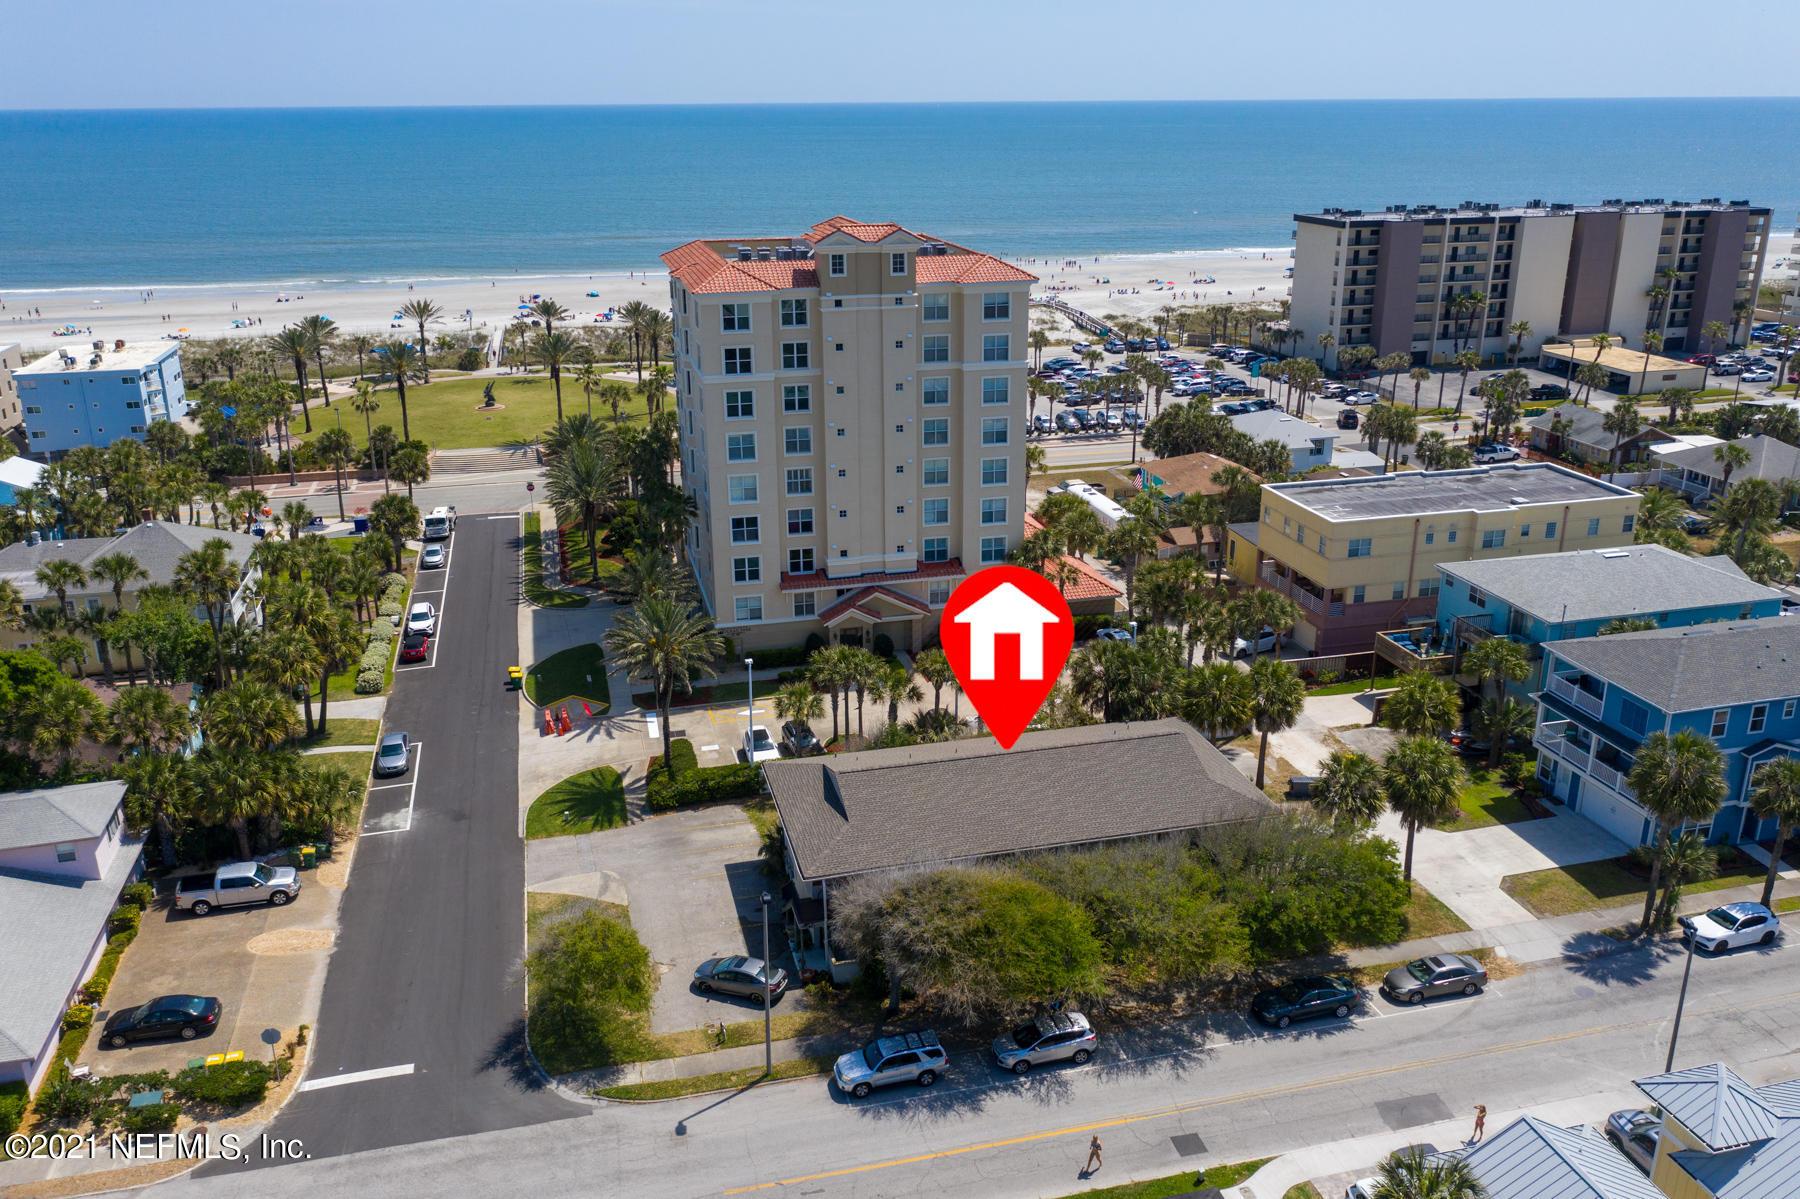 501 2ND ST S, JACKSONVILLE BEACH, Florida 32250, 2 Bedrooms Bedrooms, ,1 BathroomBathrooms,Condominium,For Sale,501 2ND ST S,1103967